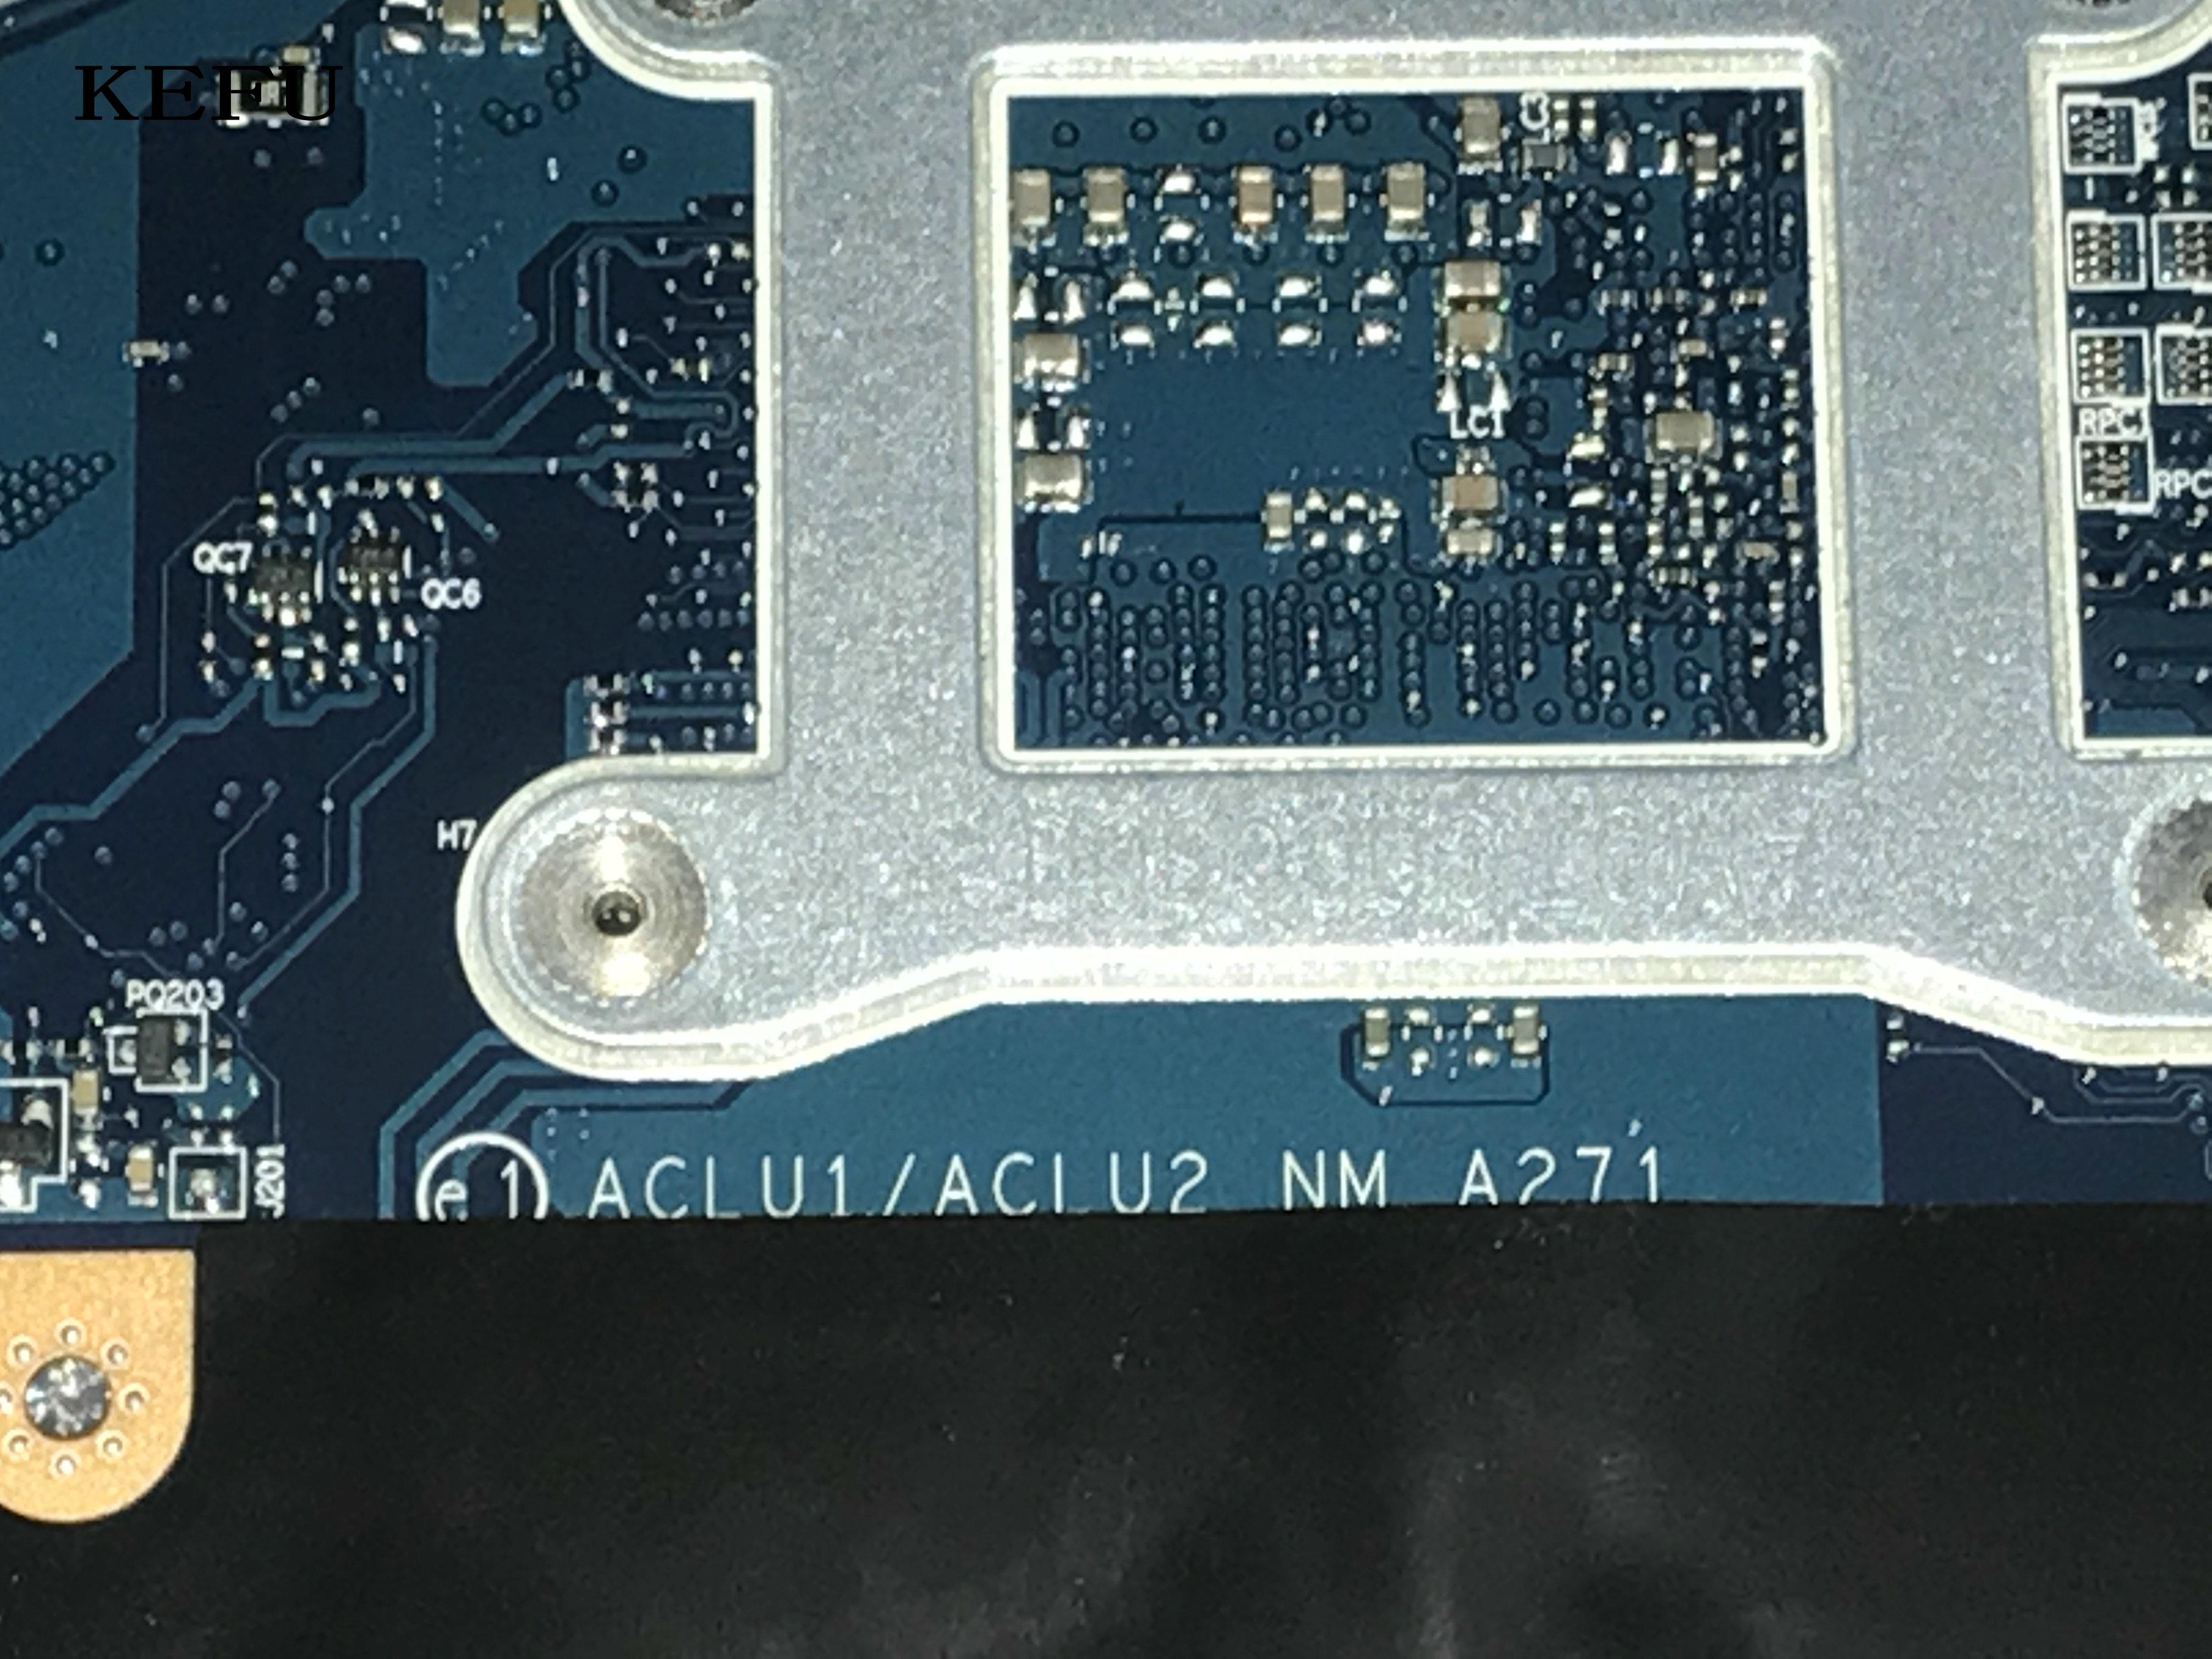 KEFU 100% nuevo, ACLU1/ ACLU2 NM-A271 placa base para portátil para LENOVO G40-70 NOTEBOOK PC, procesador a bordo 3558U + tarjeta de vídeo